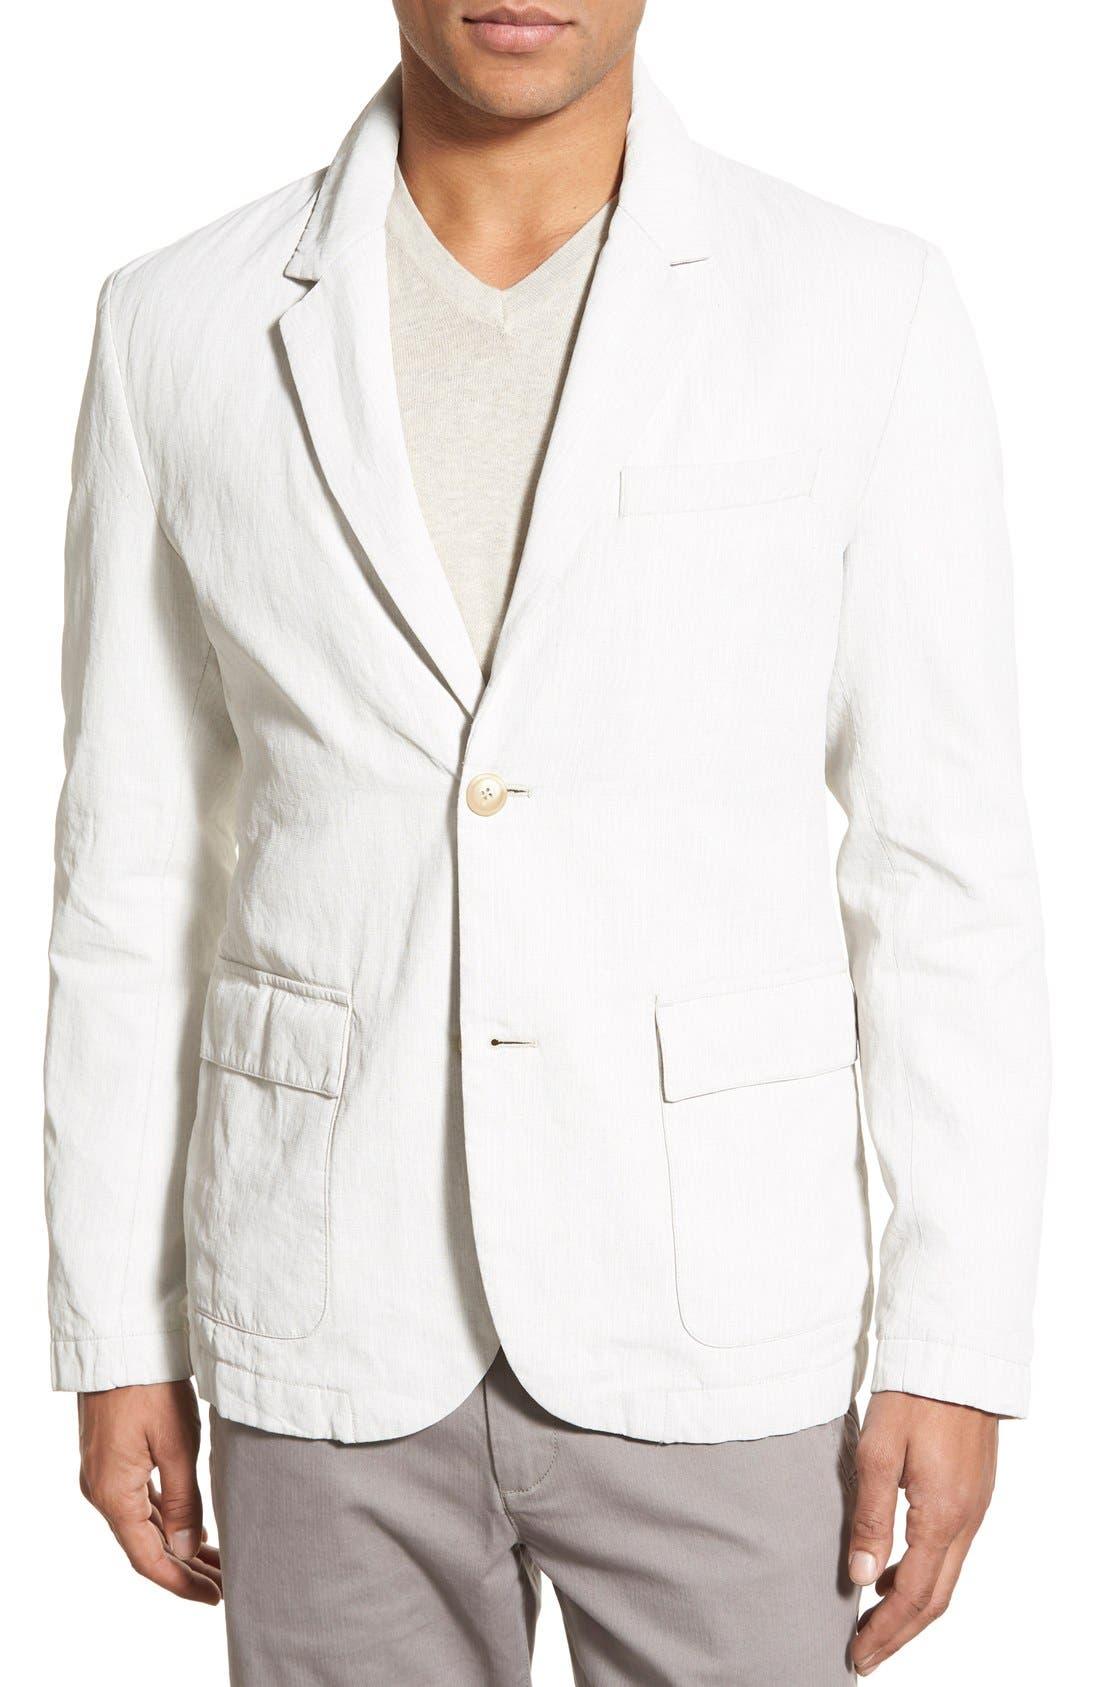 James Perse Linen Blend Sport Coat